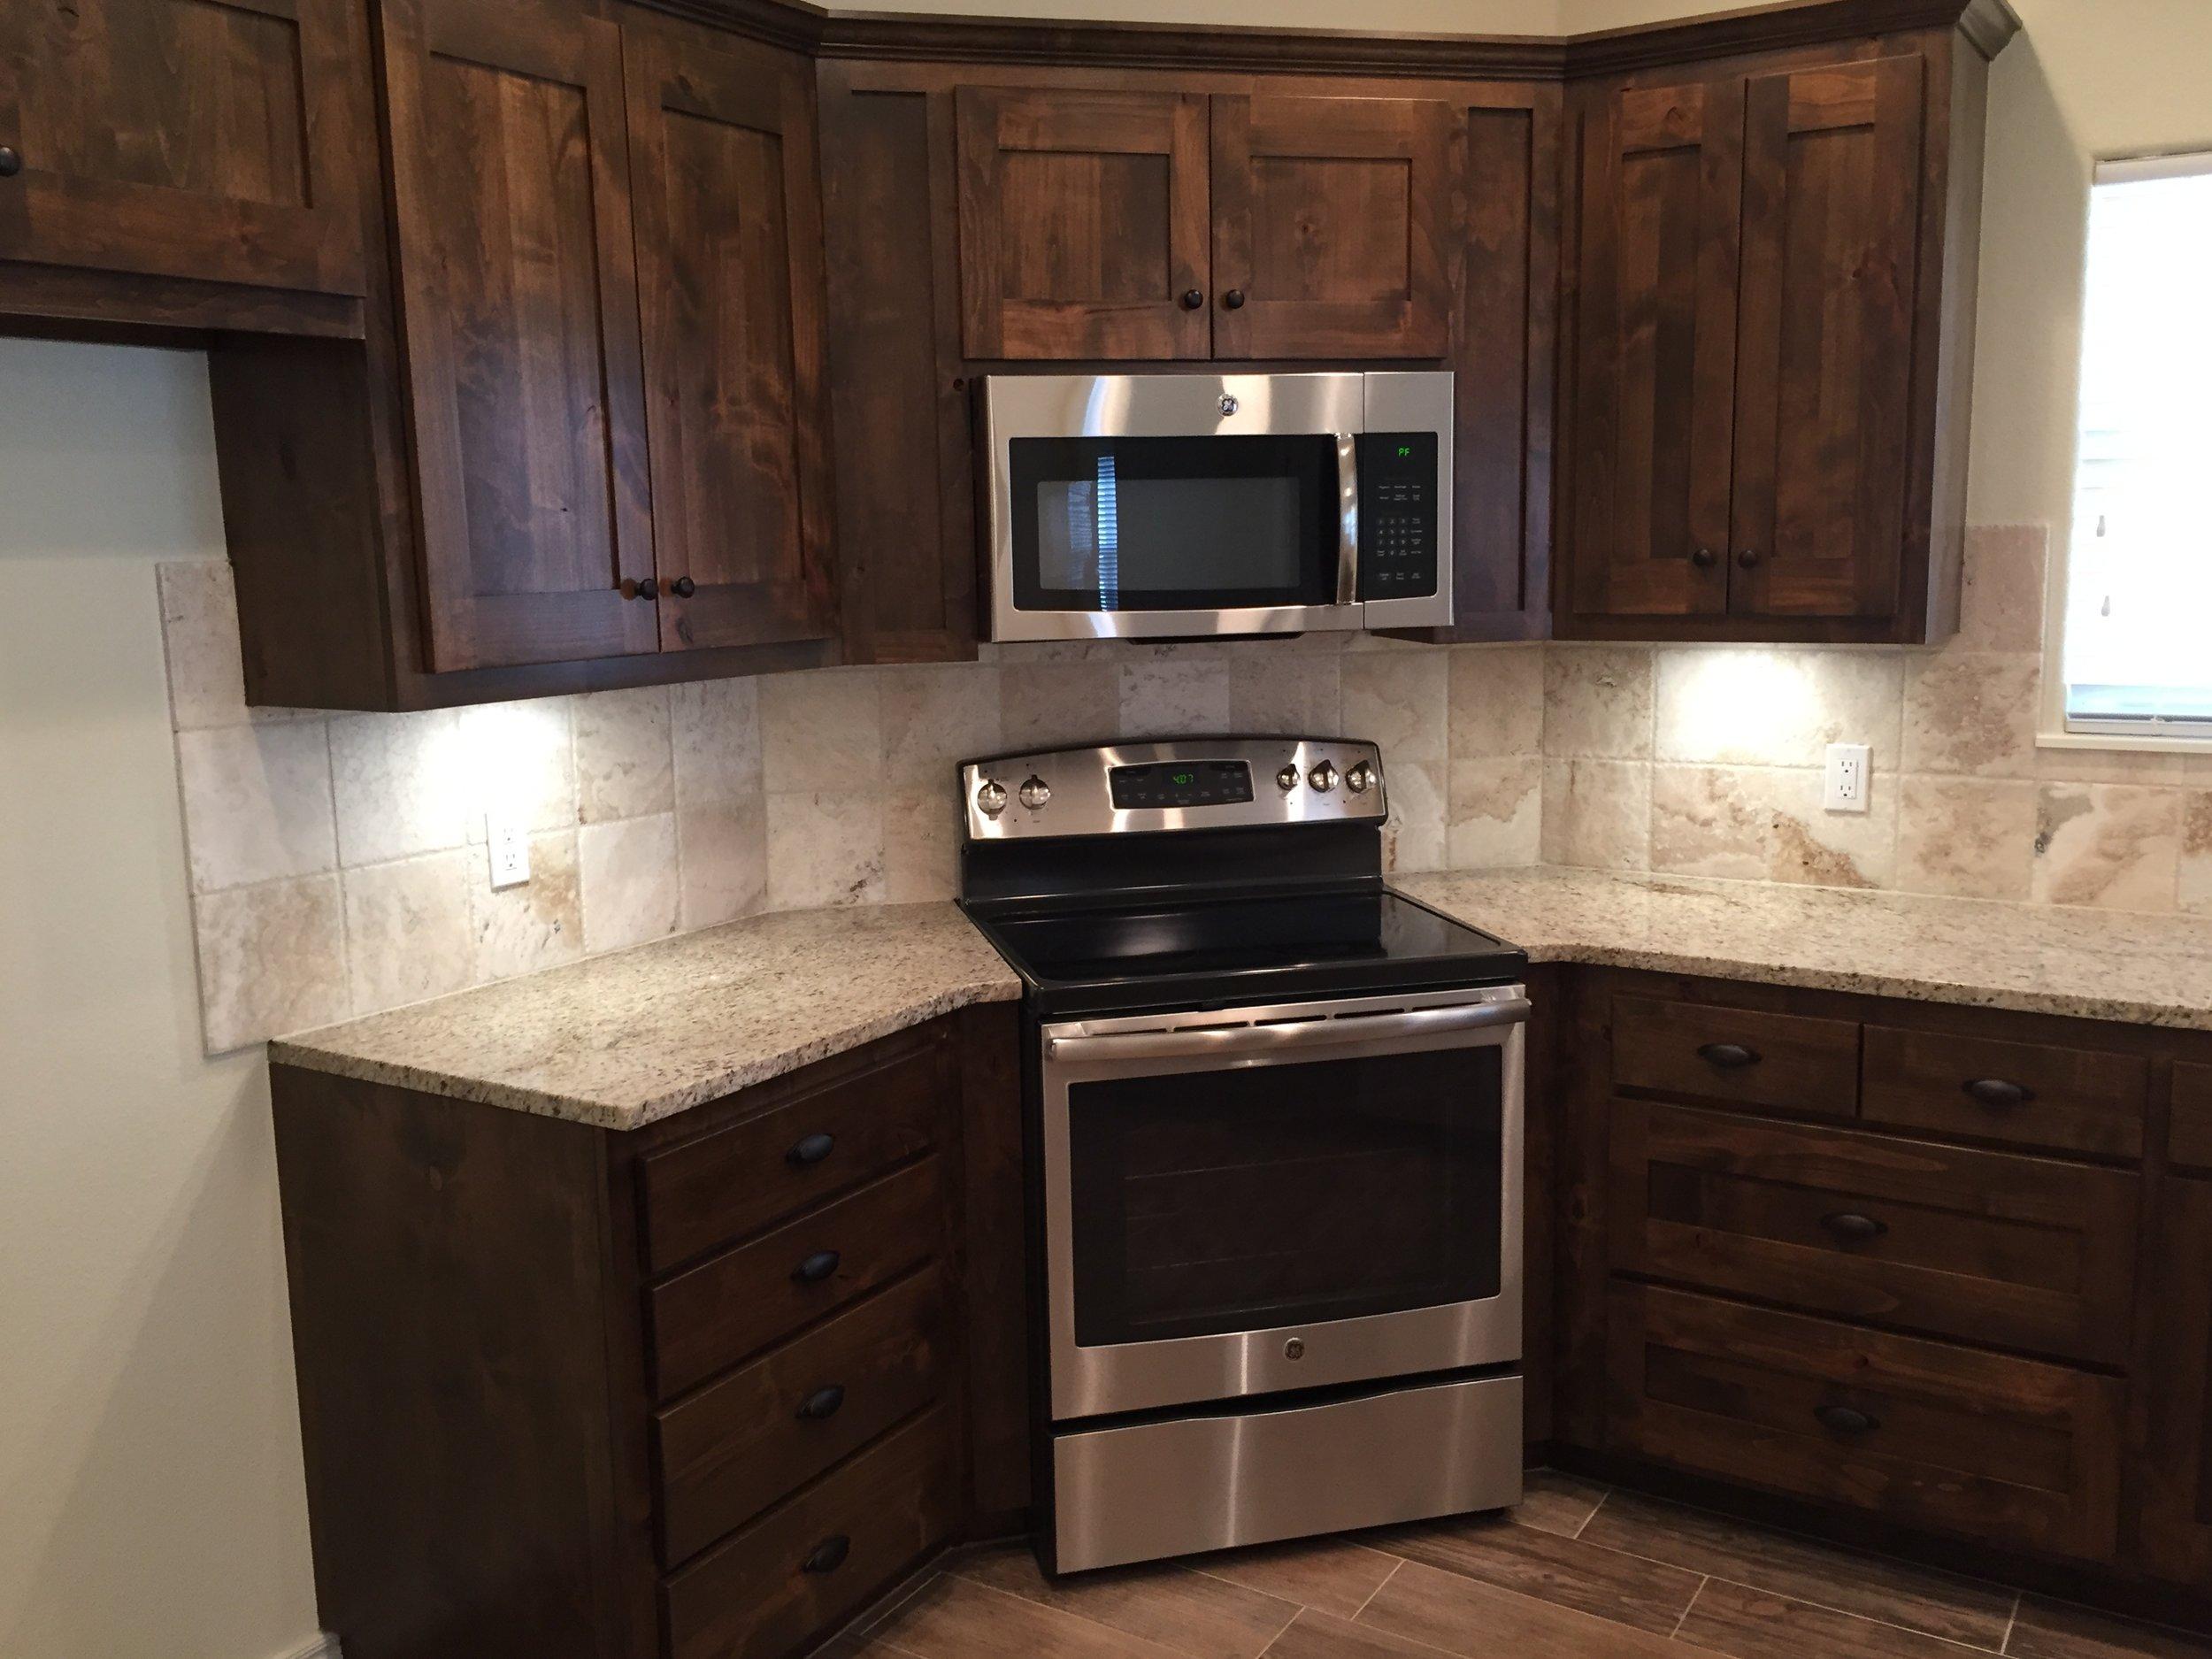 3443 kitchen range